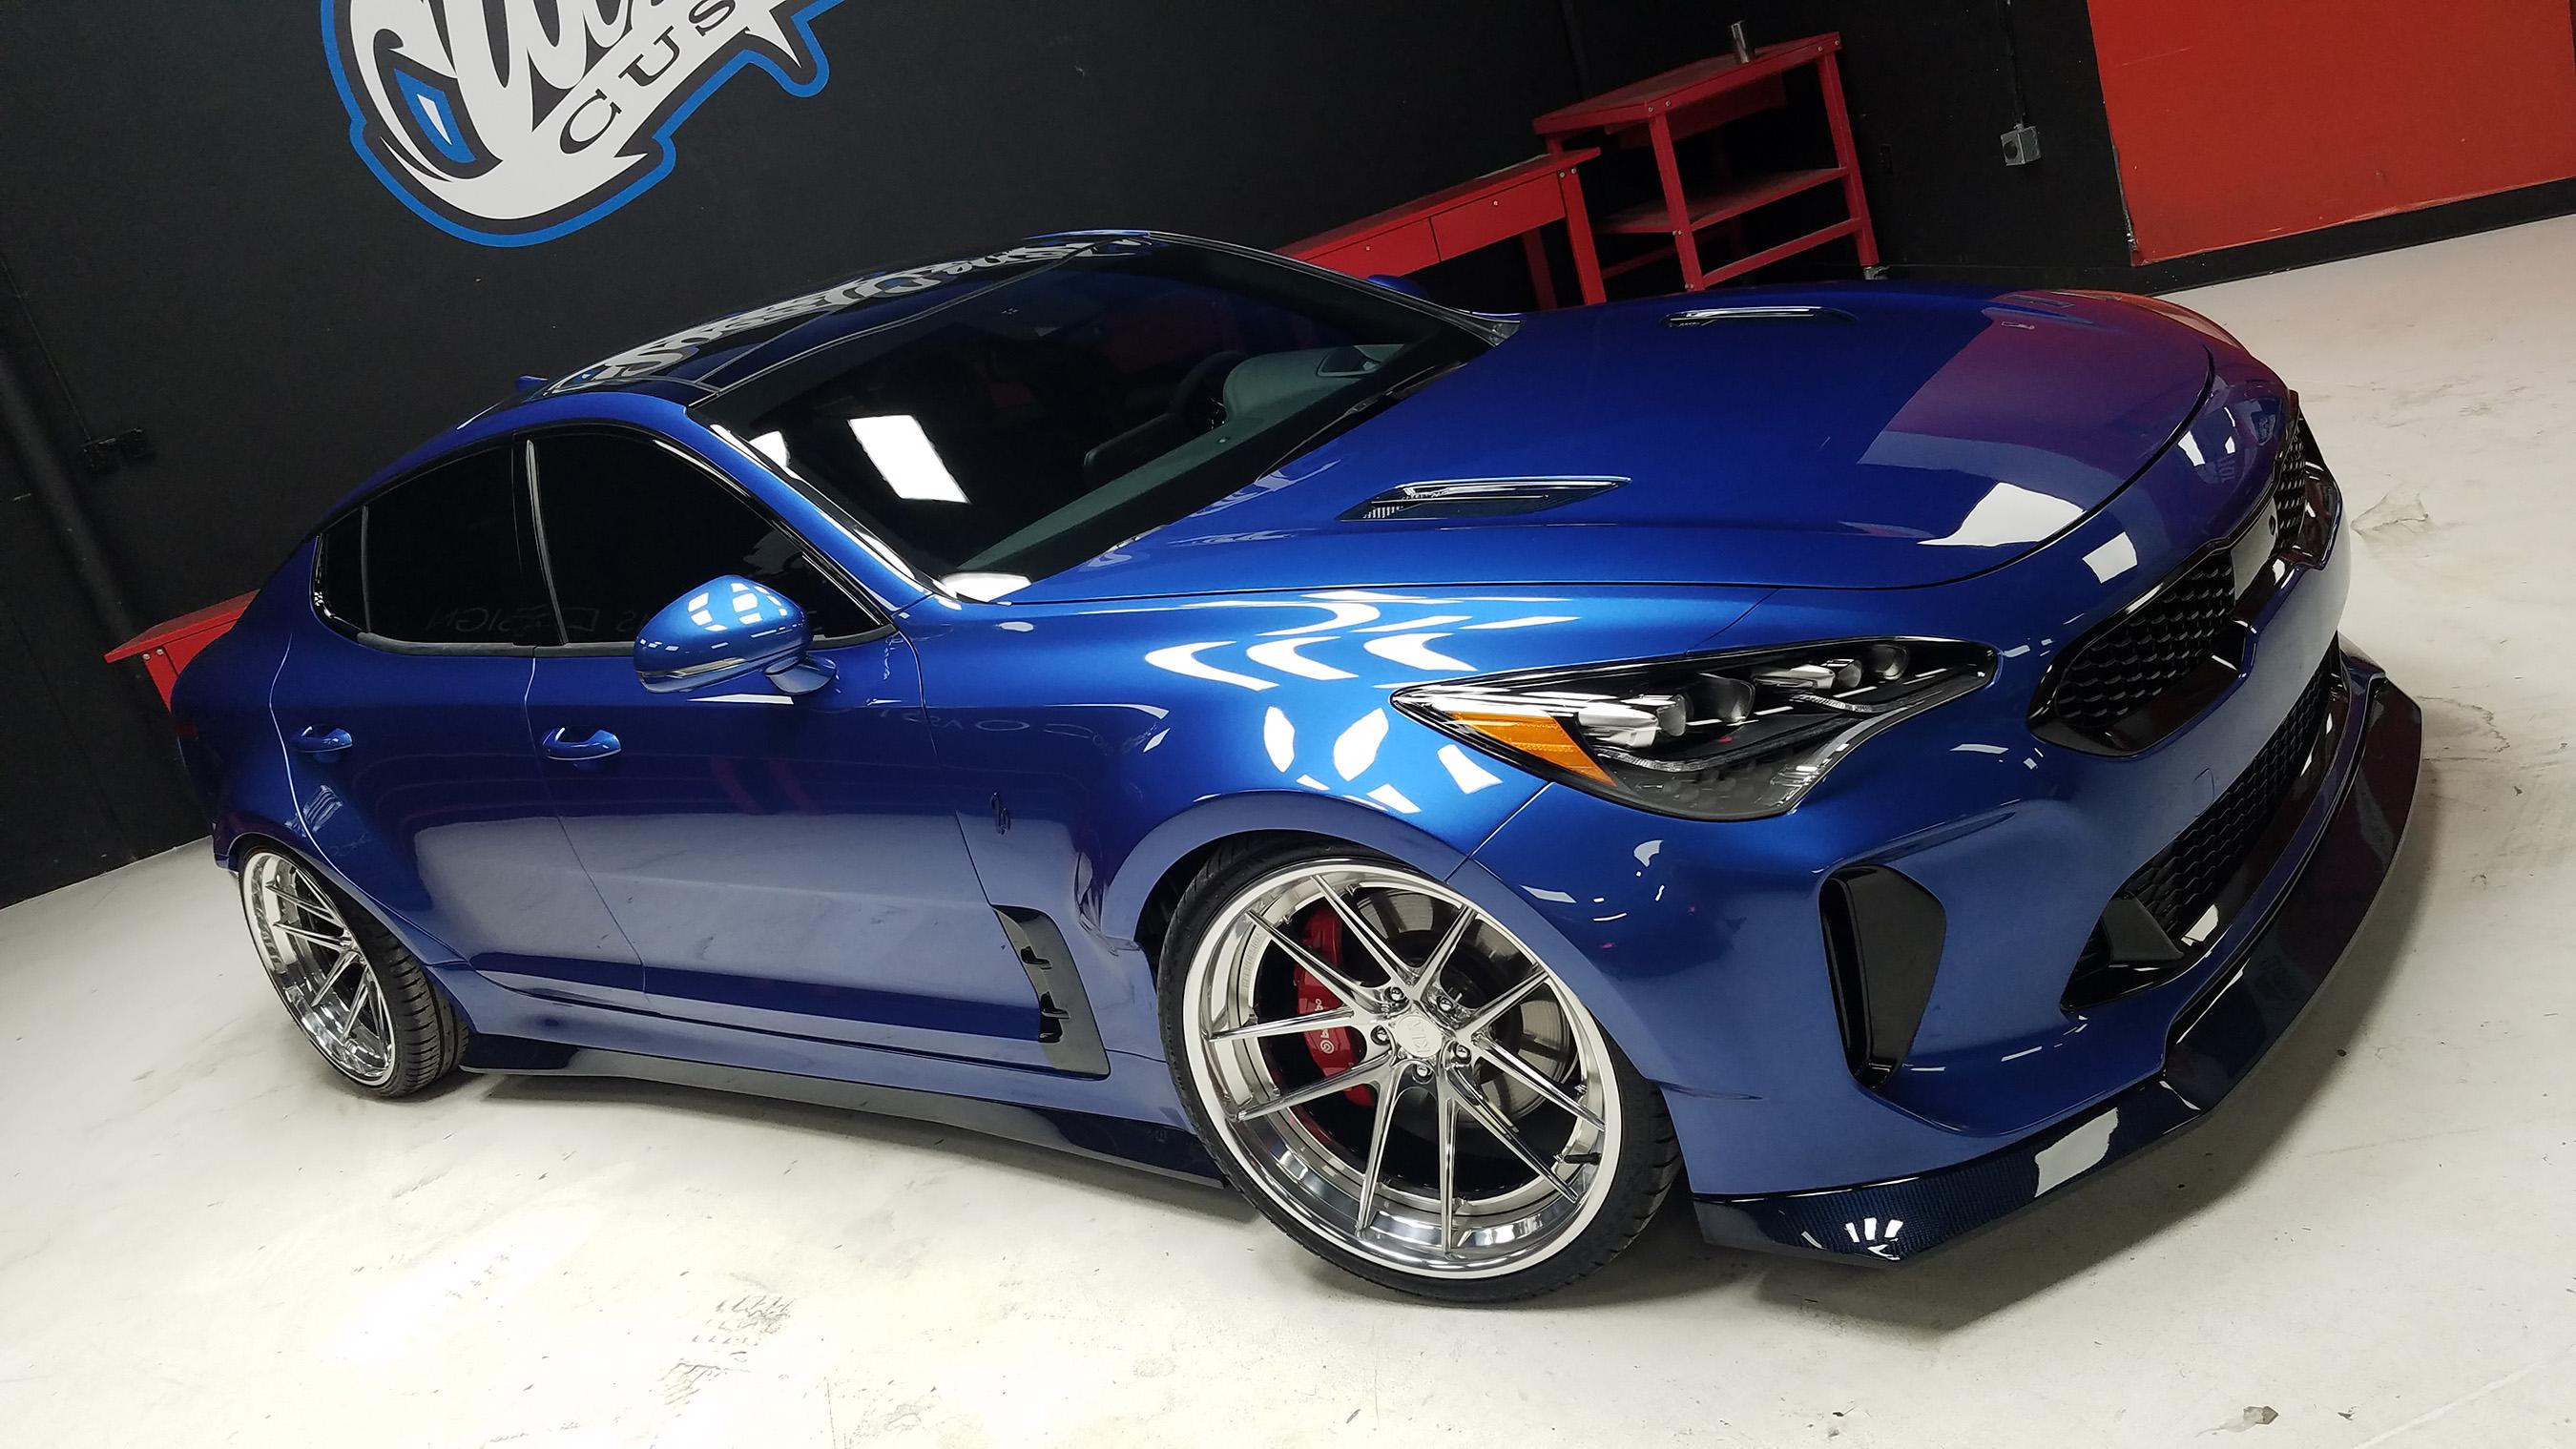 Kia motors america showcases performance style and luxury for Kia motors usa com